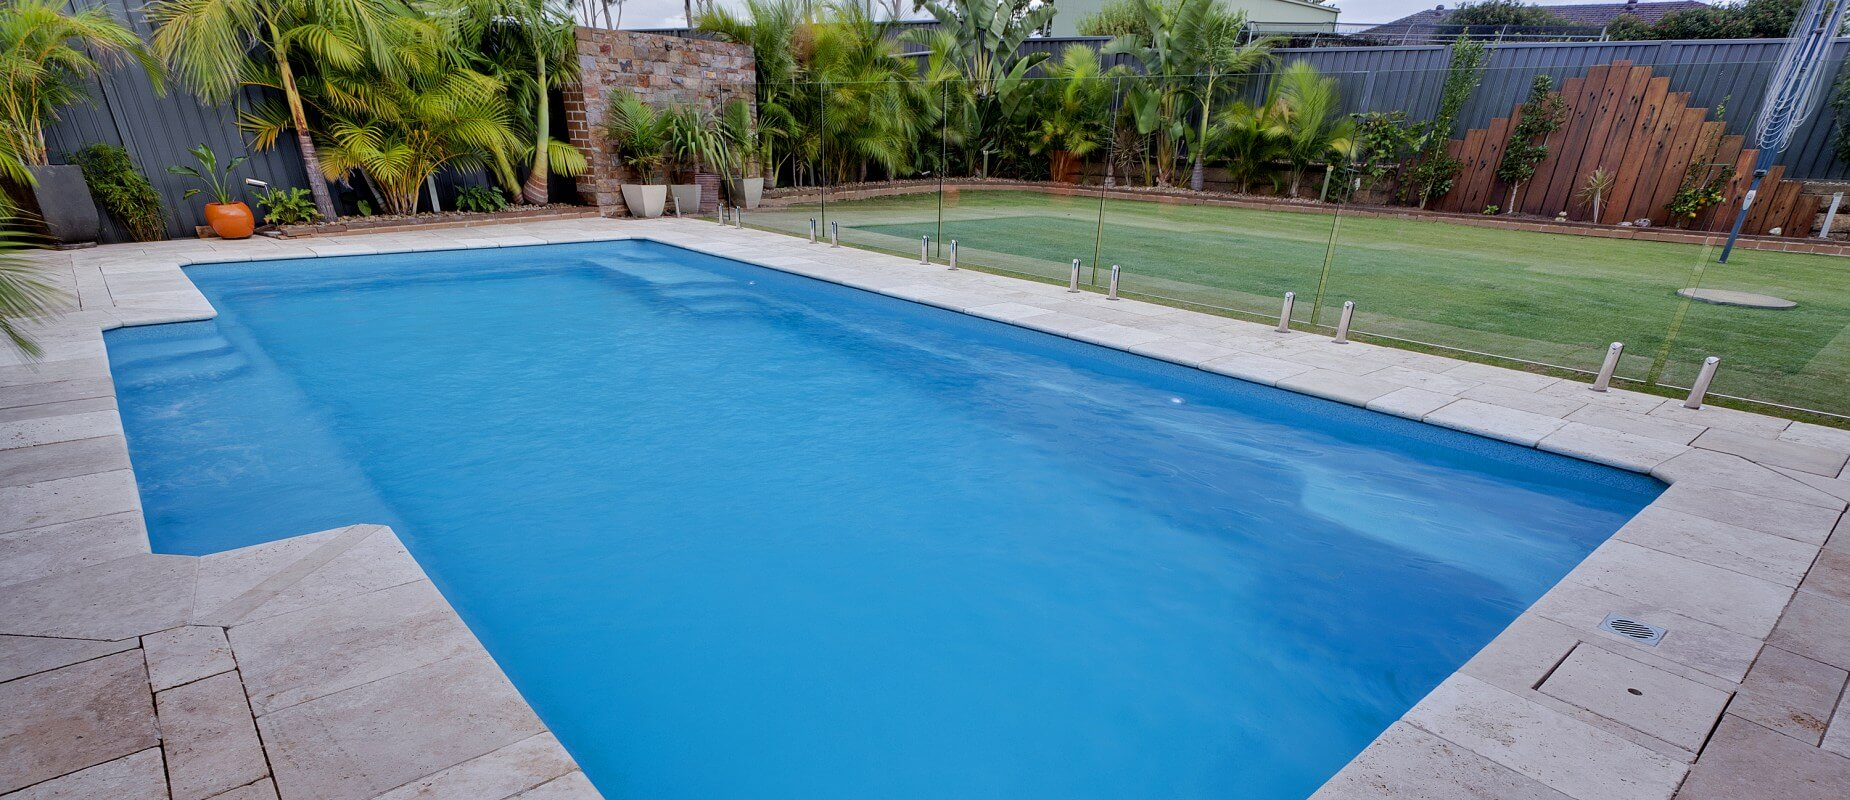 piscina de lux modele frumoase 30